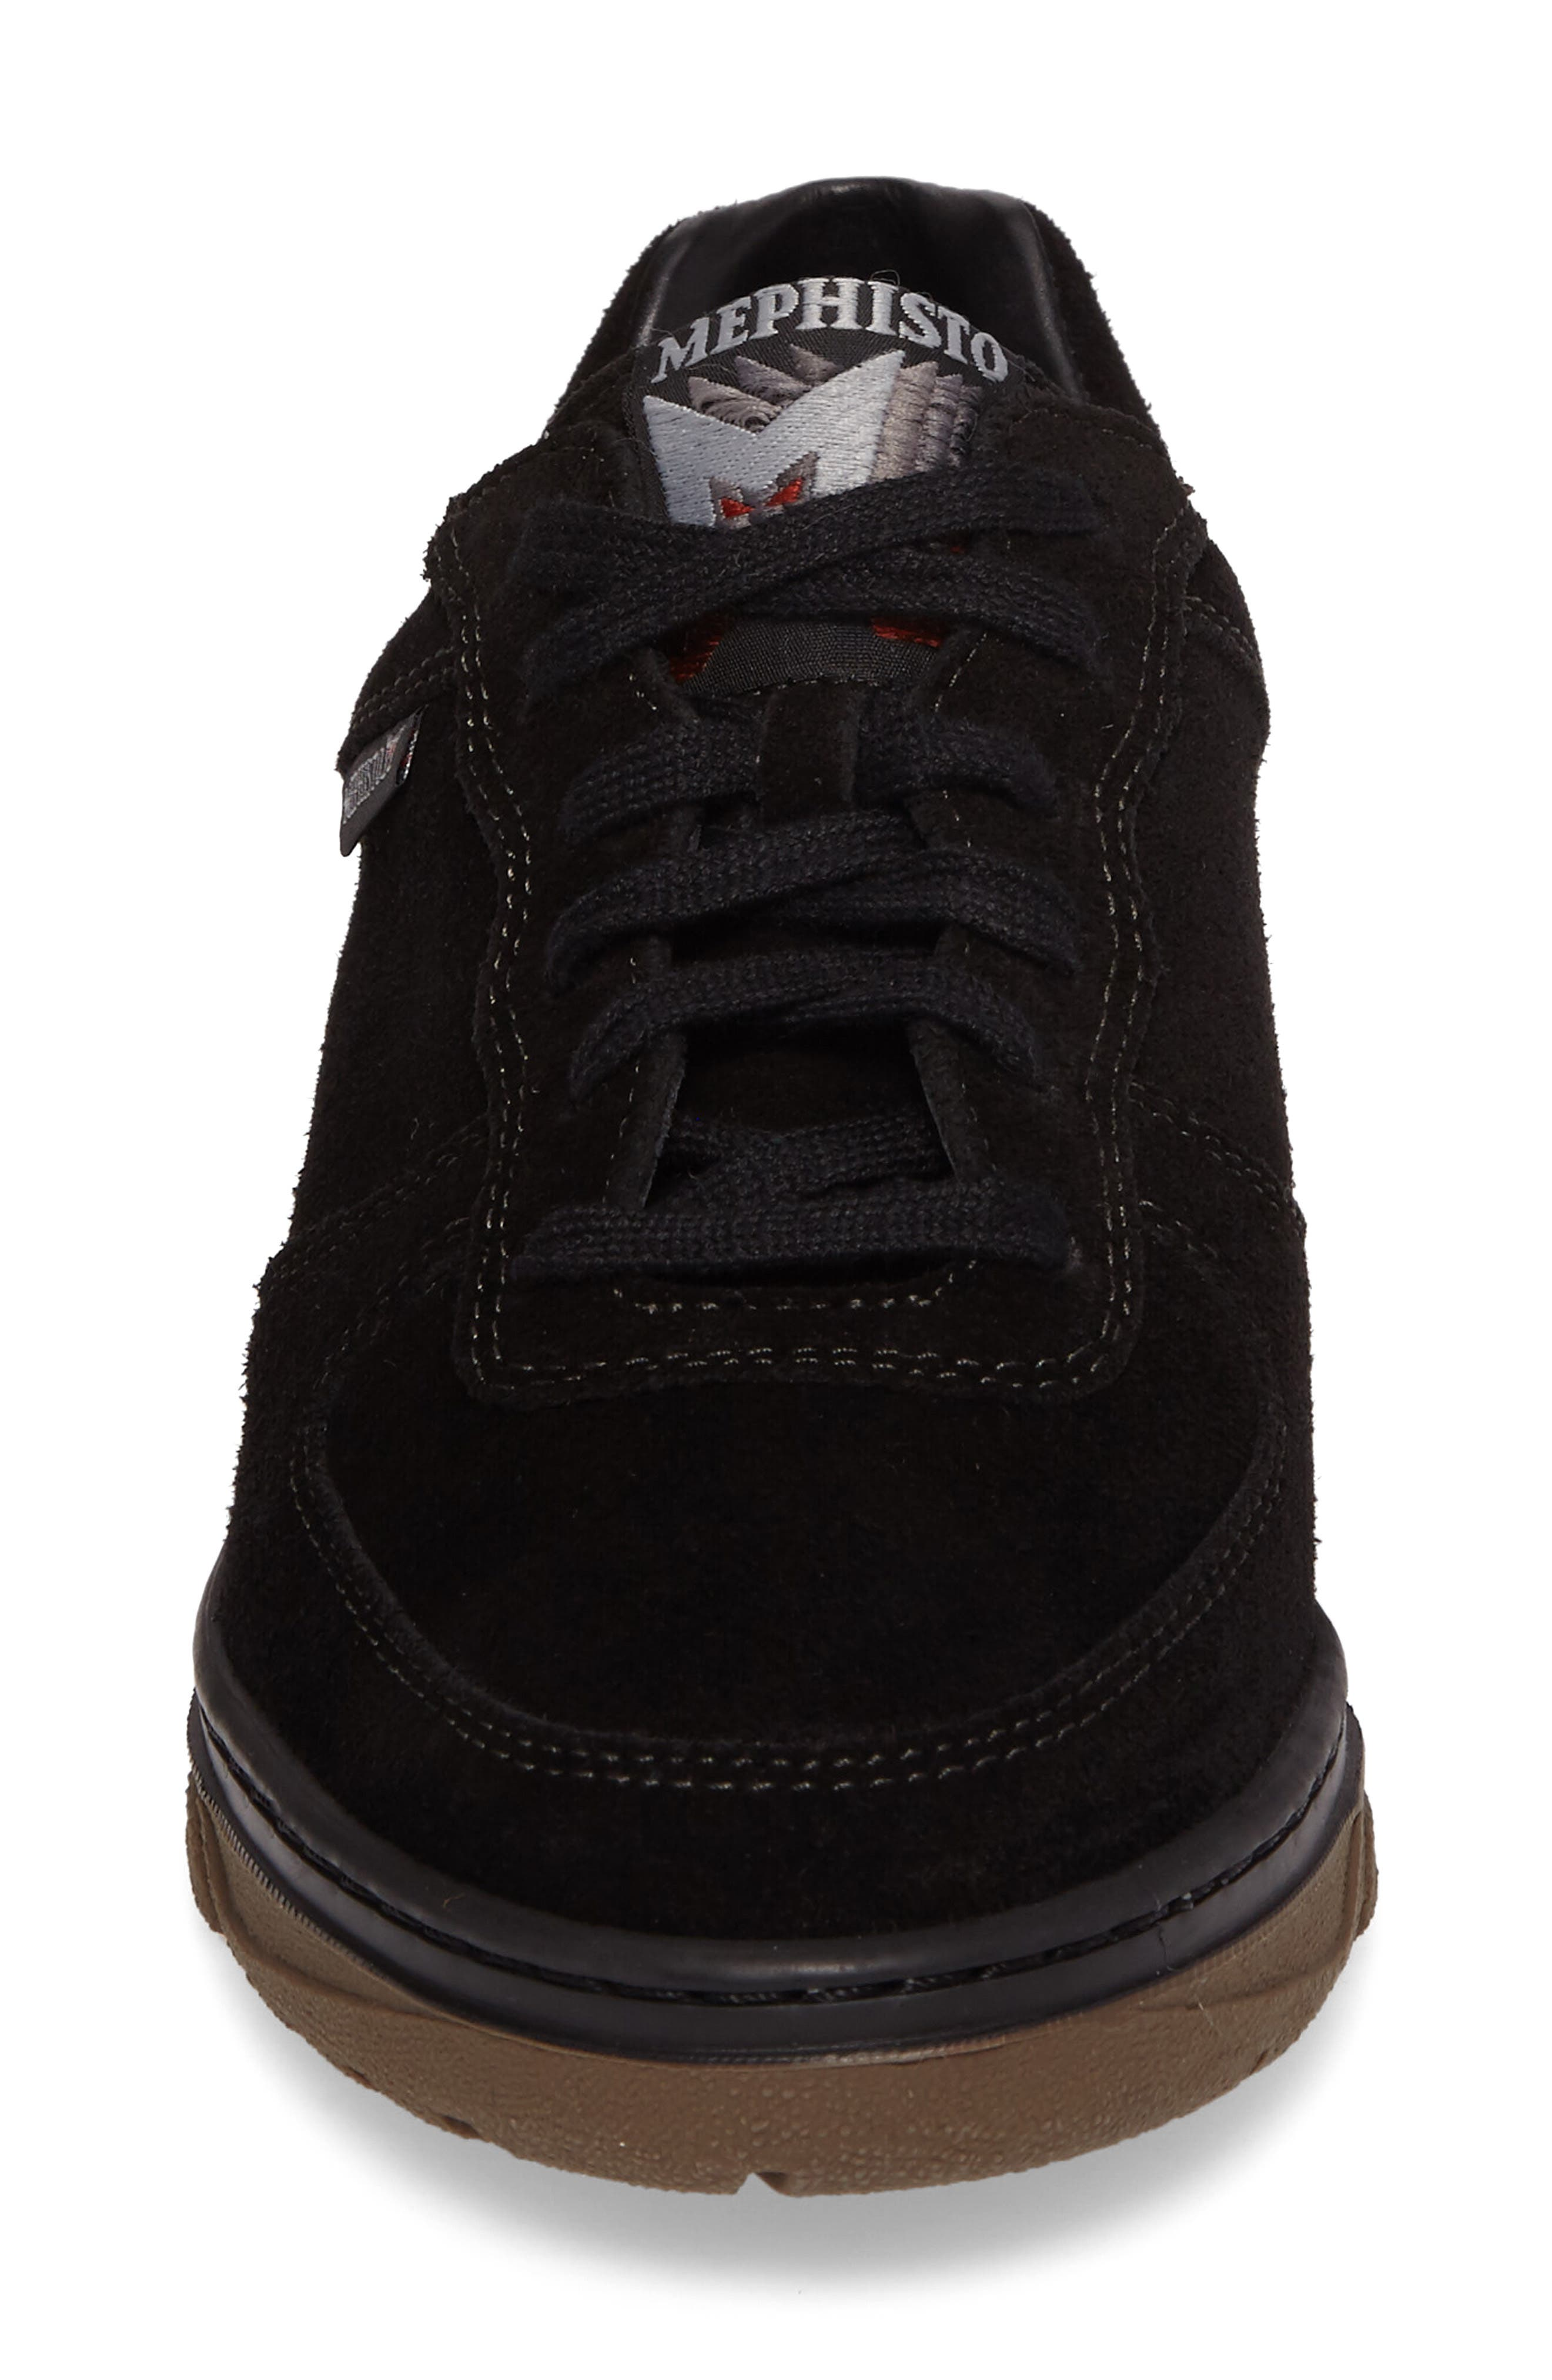 Nykita Sneaker,                             Alternate thumbnail 4, color,                             BLACK SUEDE